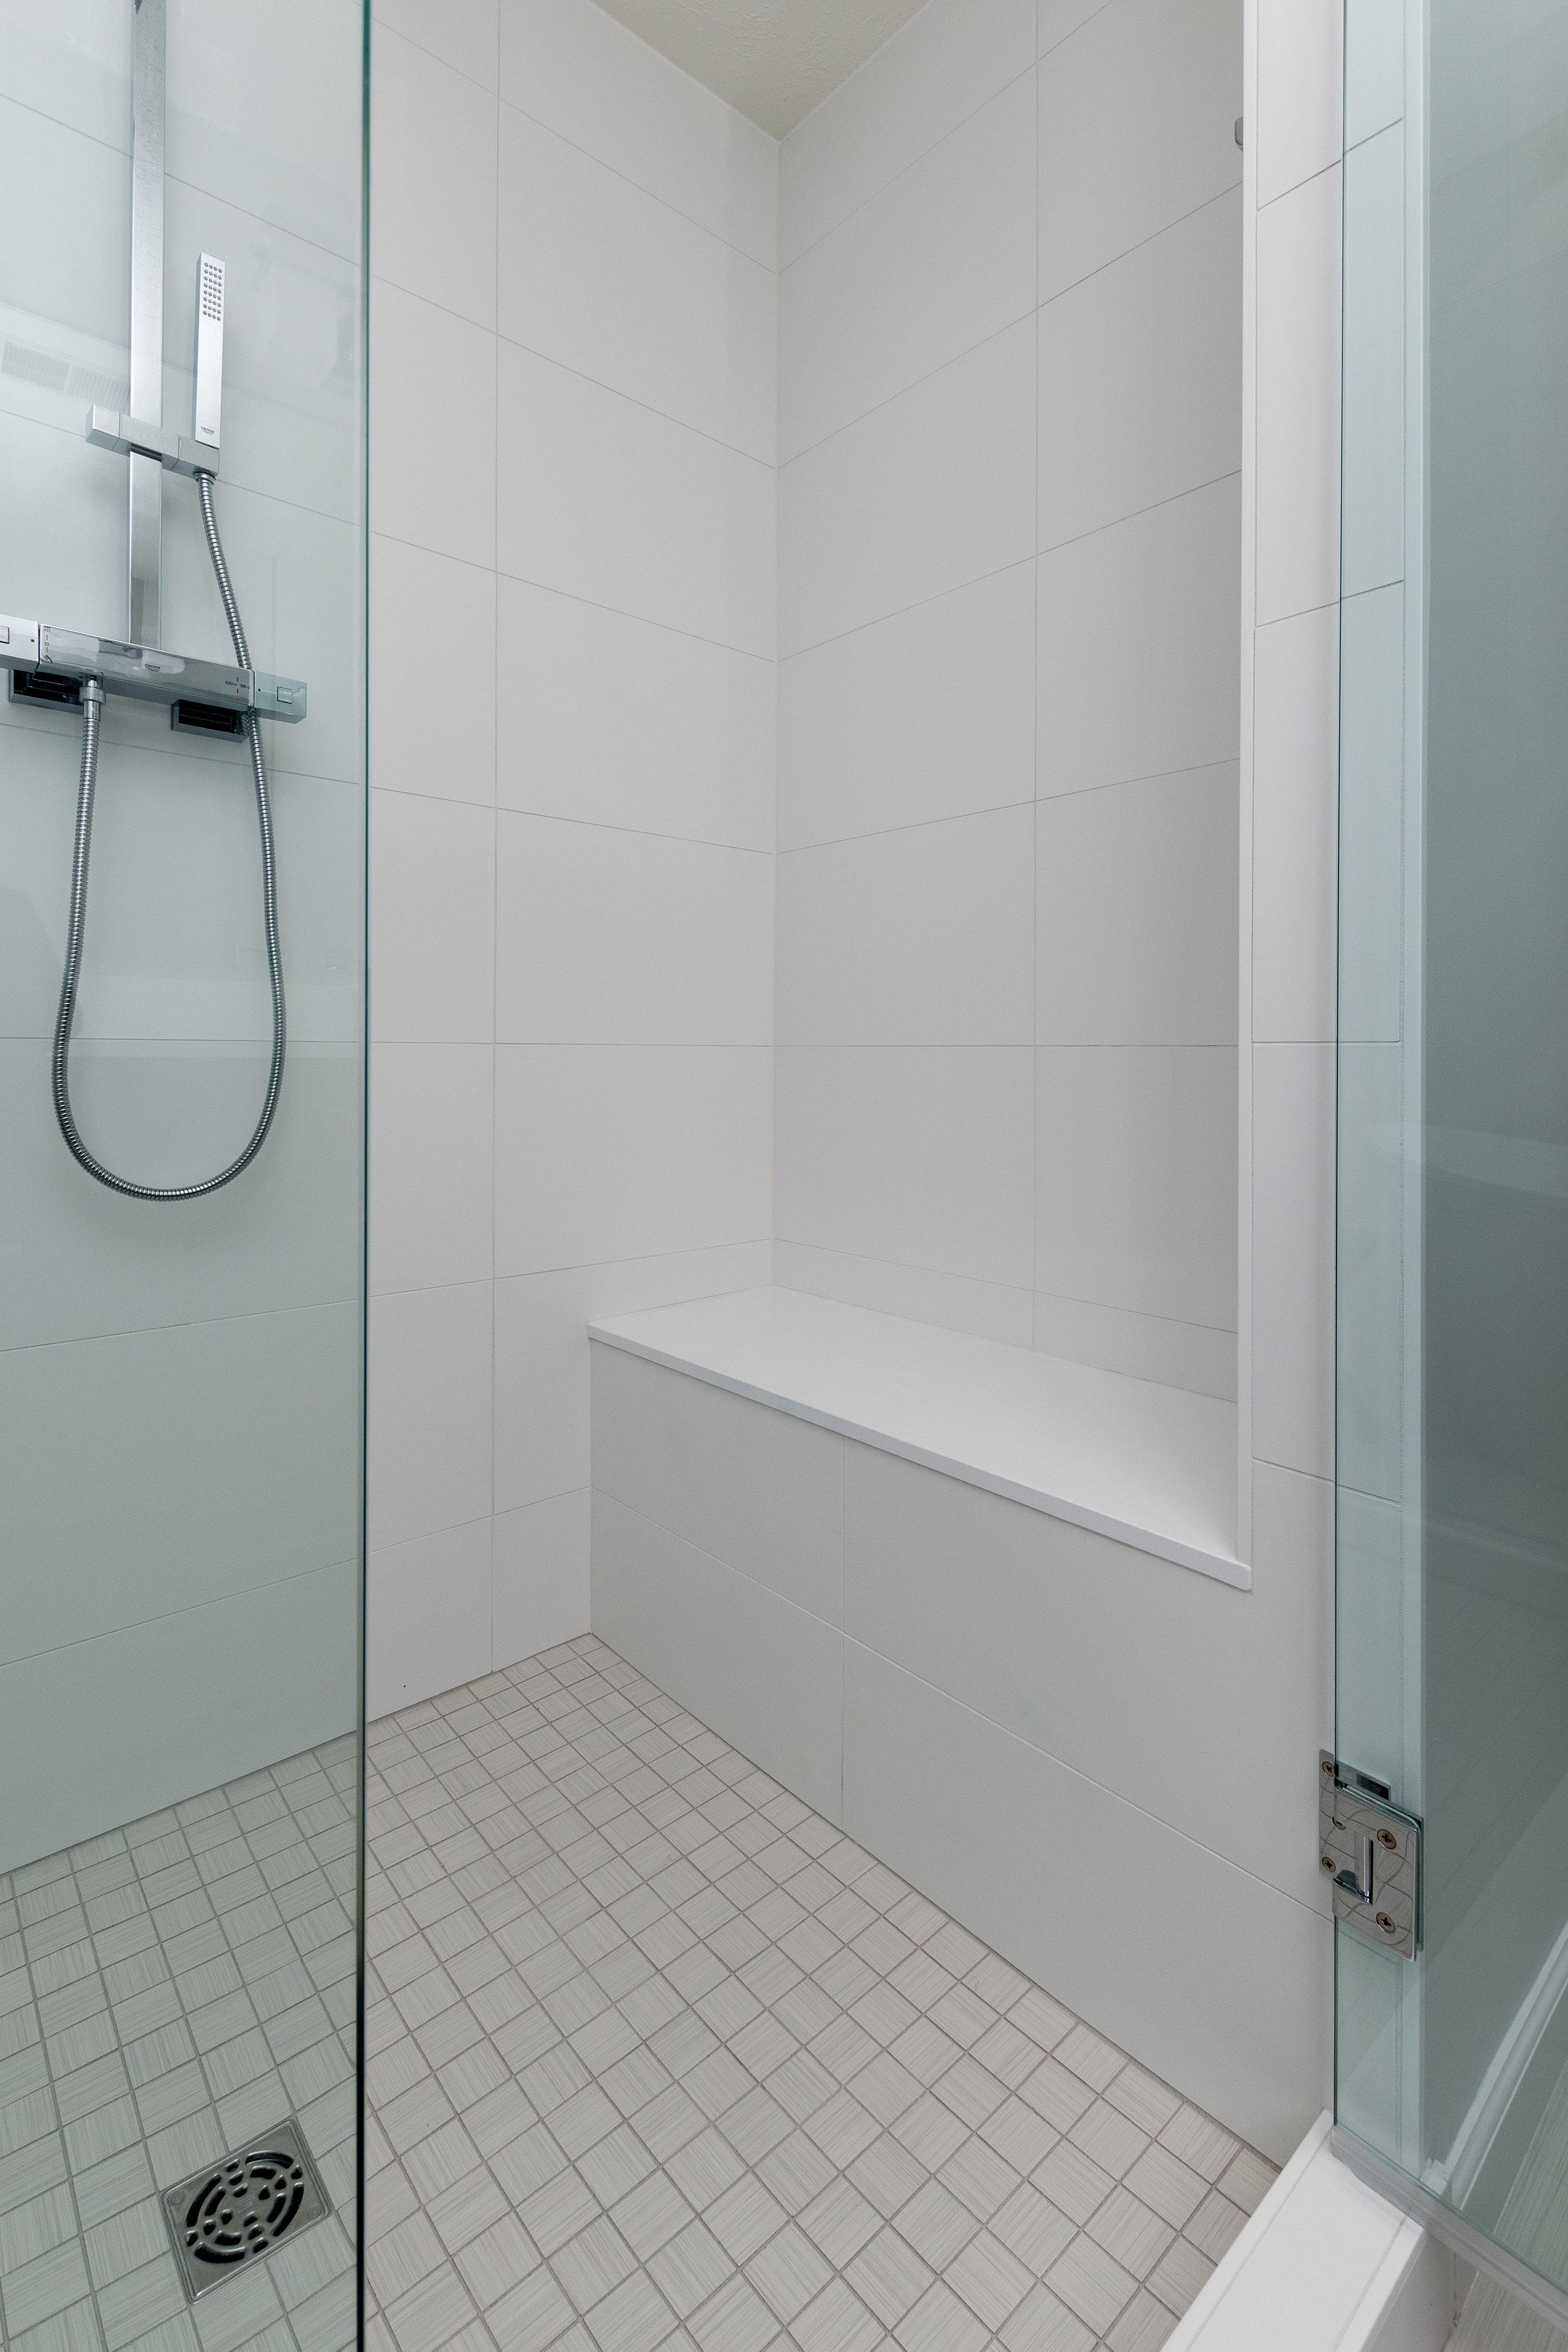 shower and shower bench.jpg